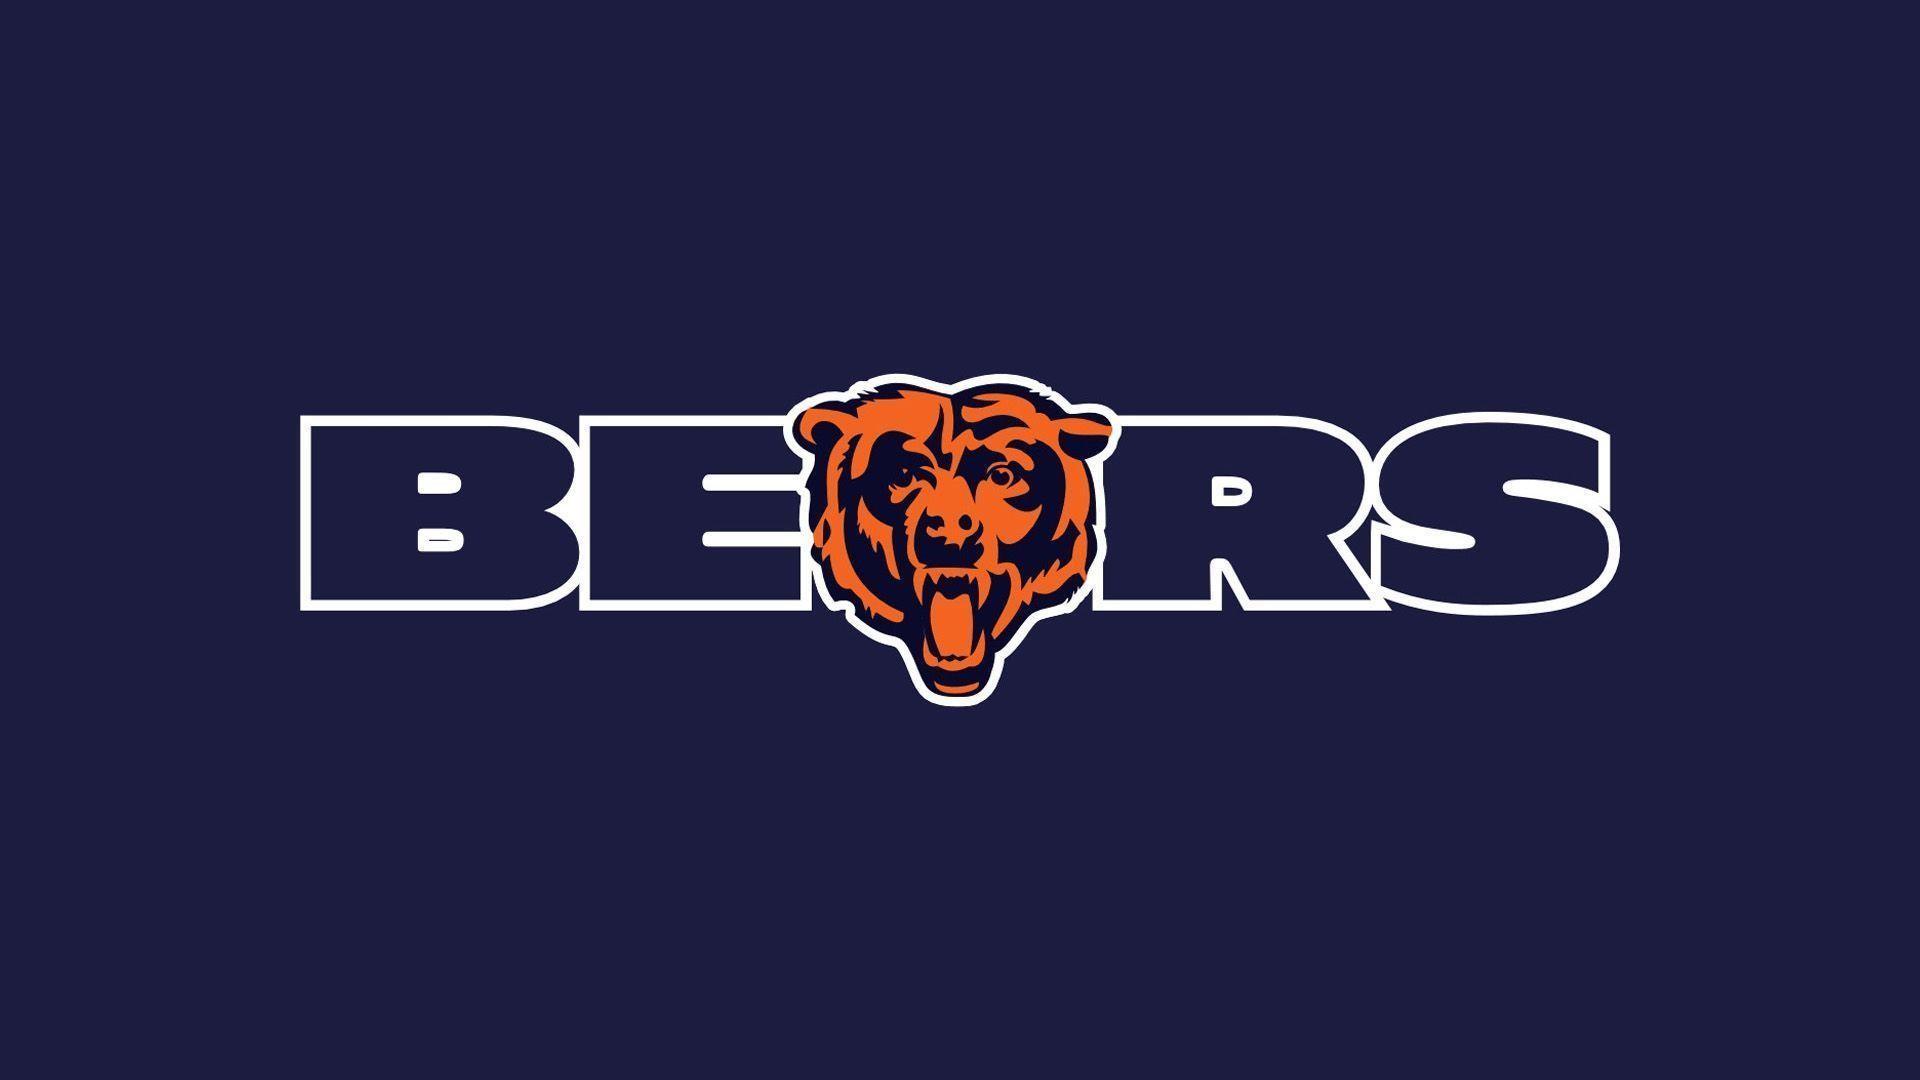 Chicago Bears Desktop Wallpapers   2021 NFL Football Wallpapers 1920x1080